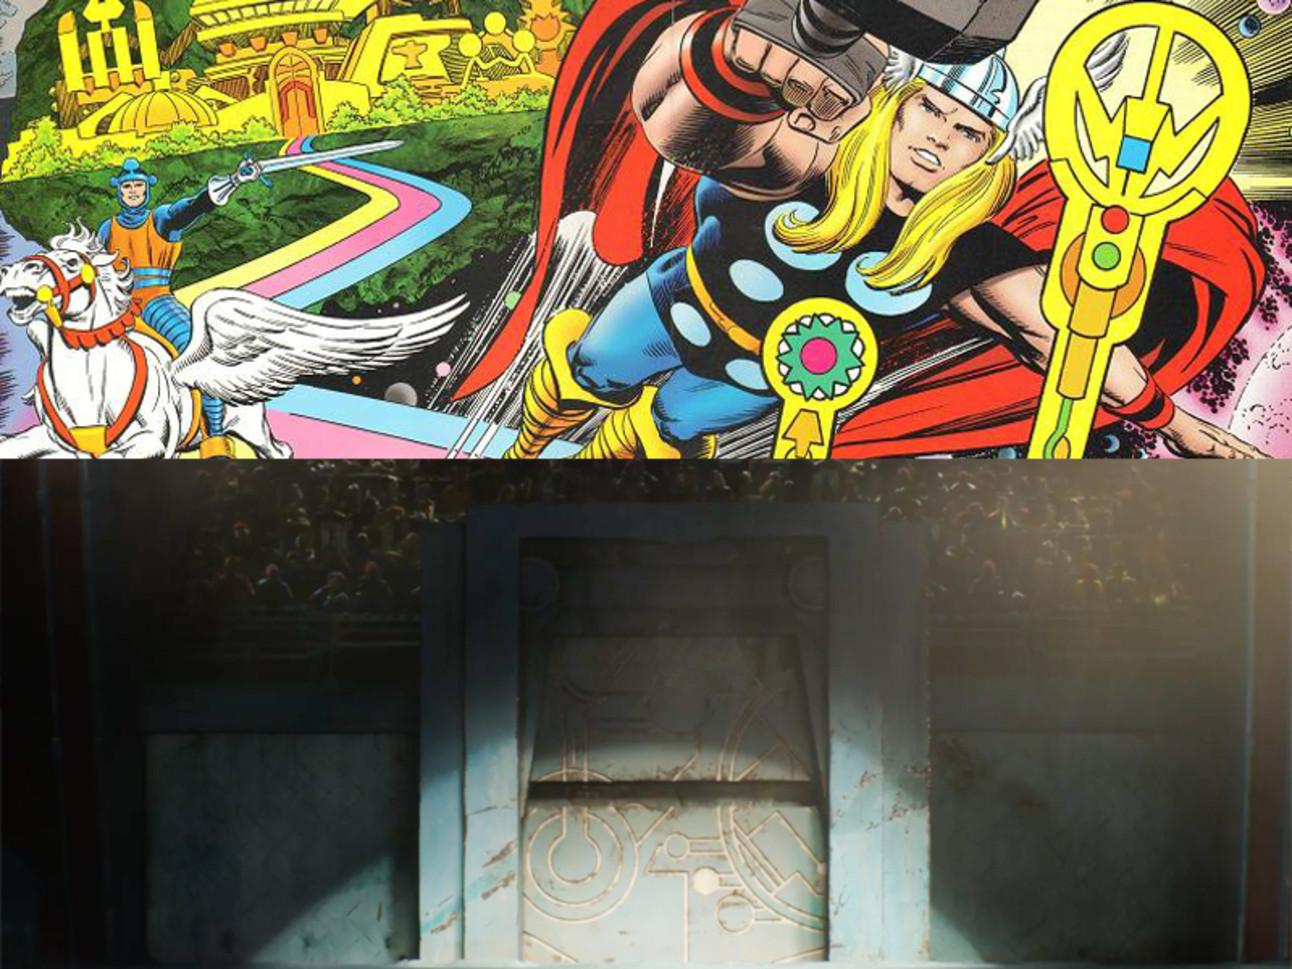 7-kirby-designs-comics-thor-ragnaraok.jpg